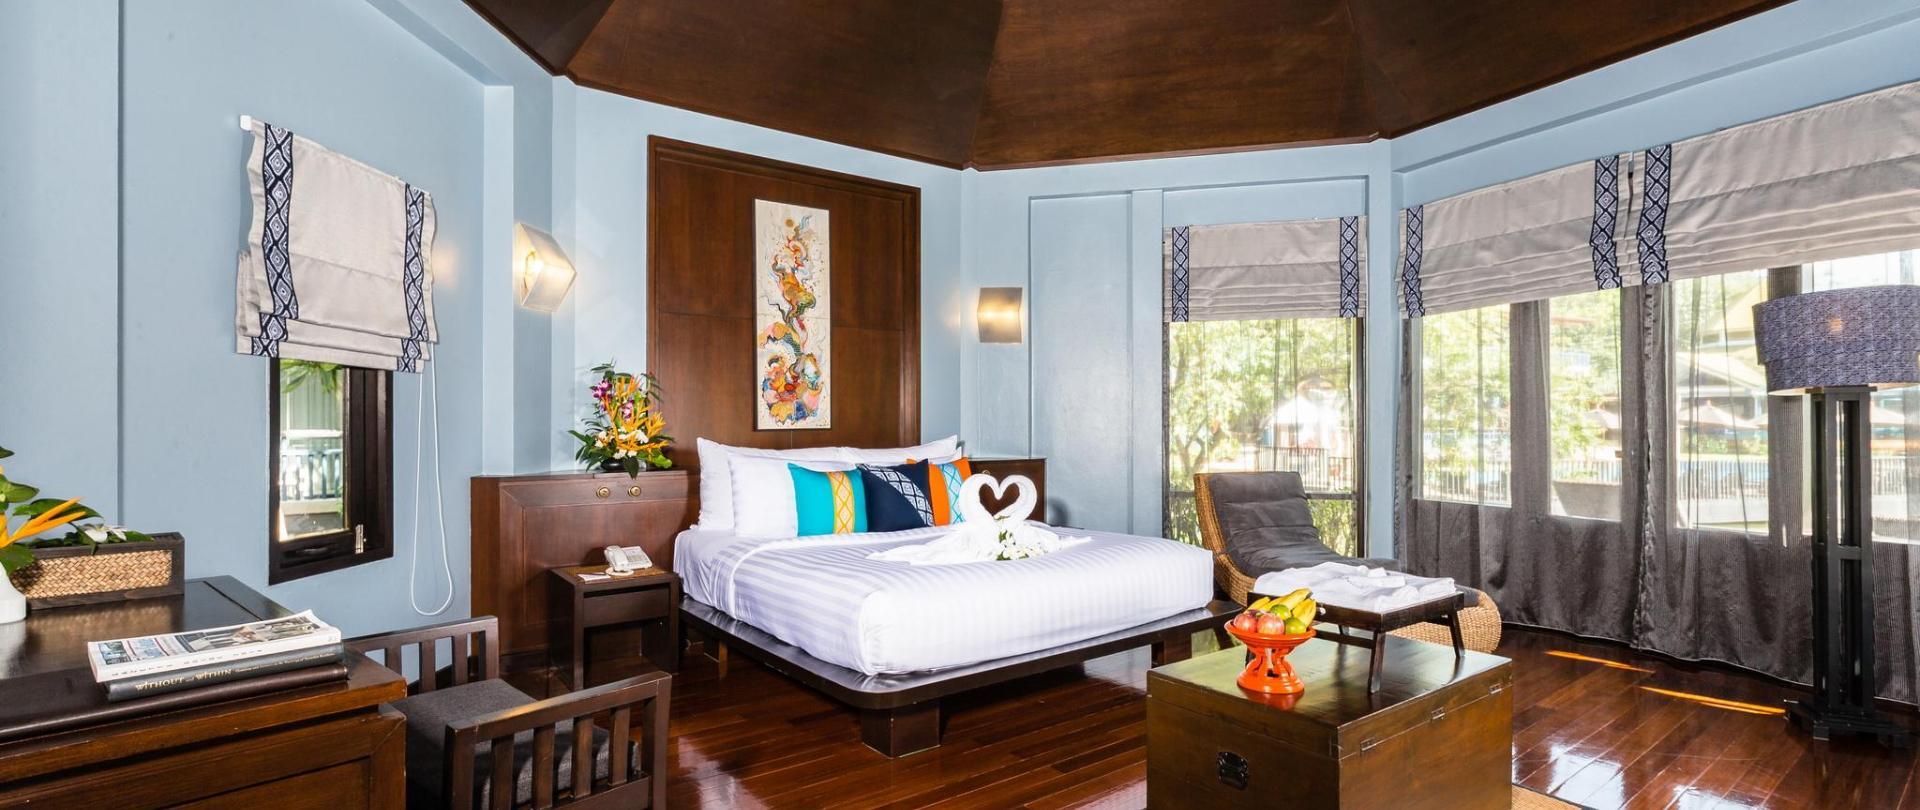 Deluxe Cottage 1.jpg